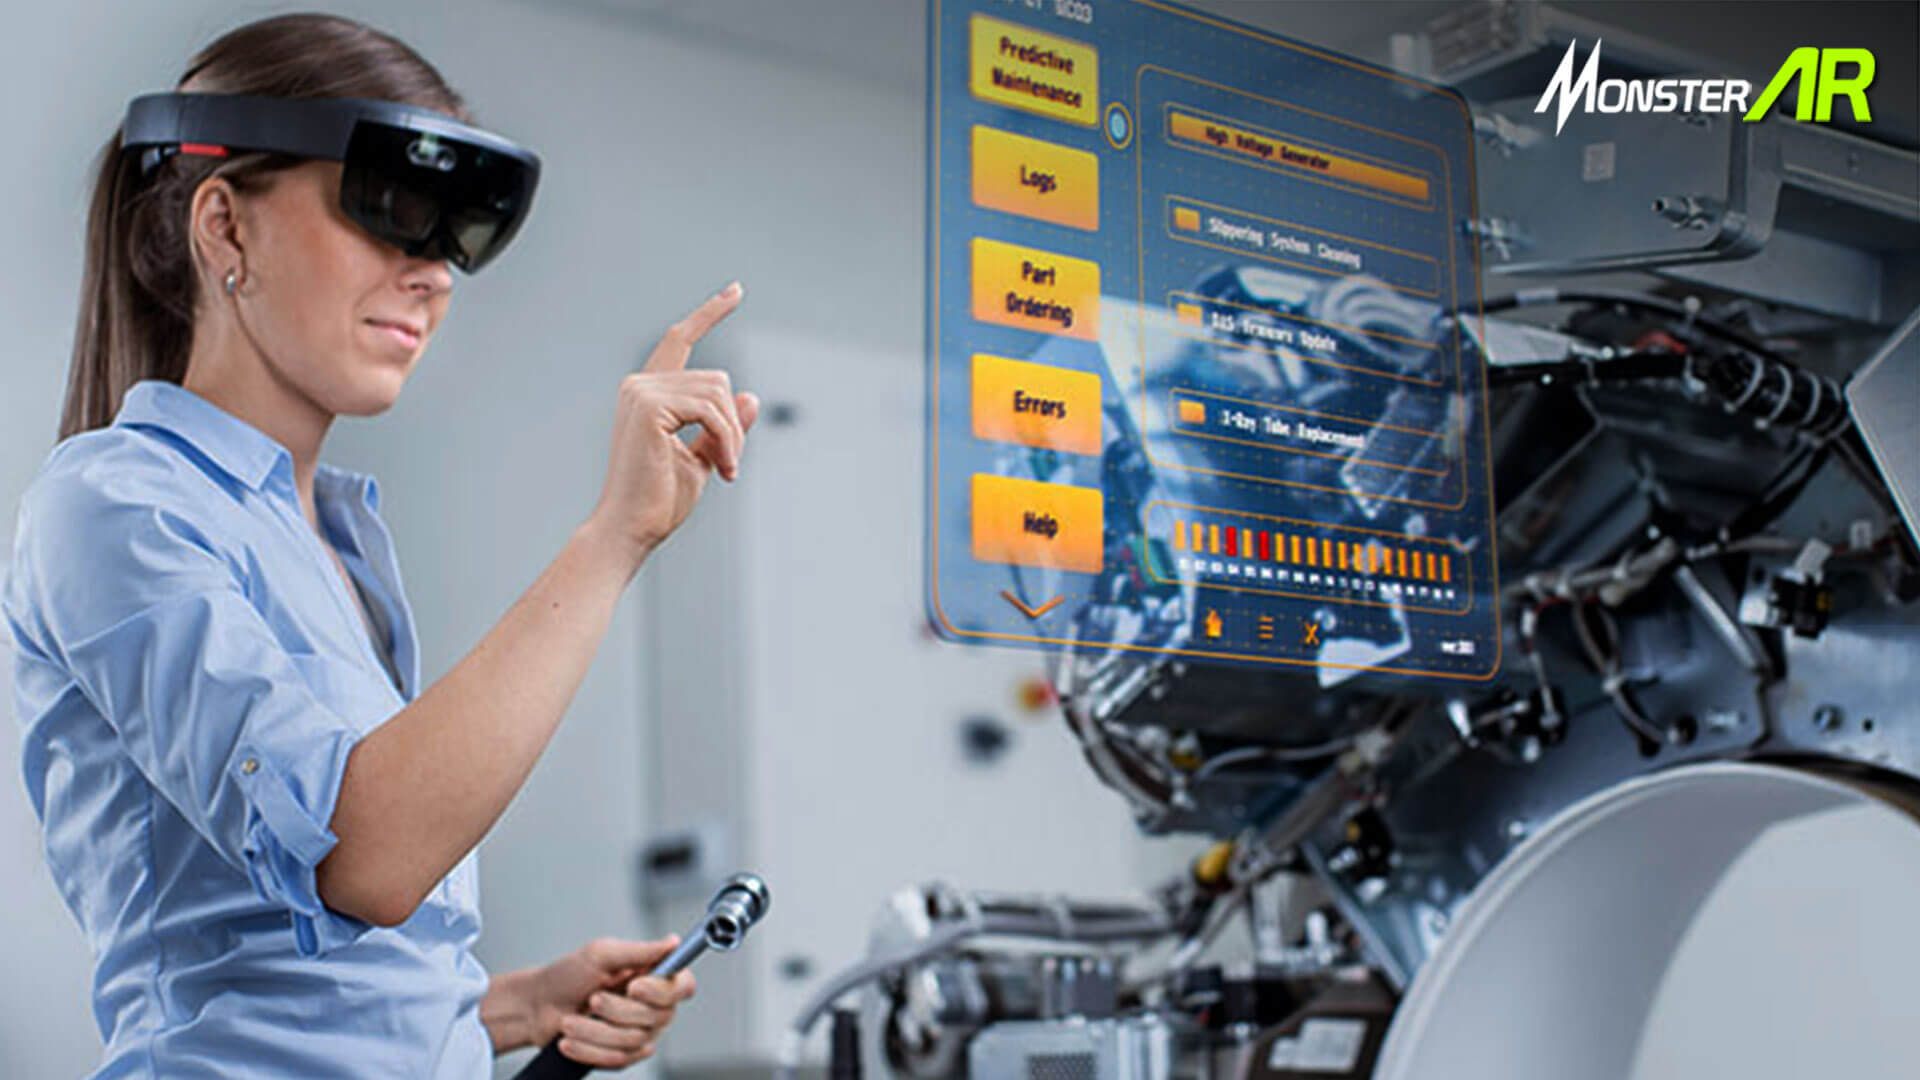 Digitalisasi Bisnis AR/VR